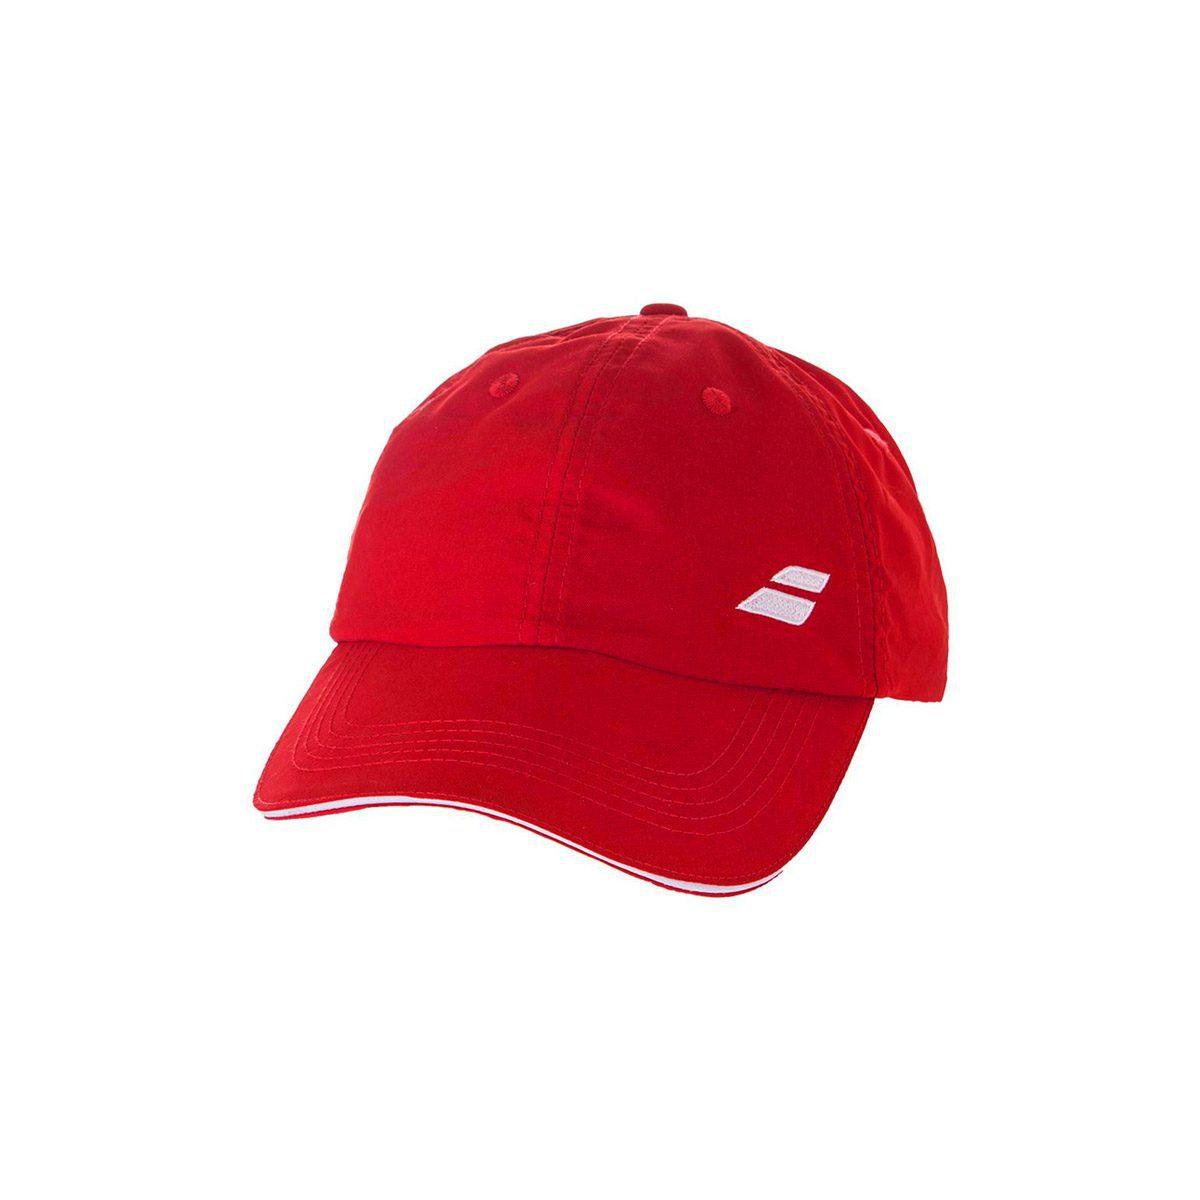 Babolat Basic Logo Men s Cap - Red - Peake Performance Sports e5296914dace